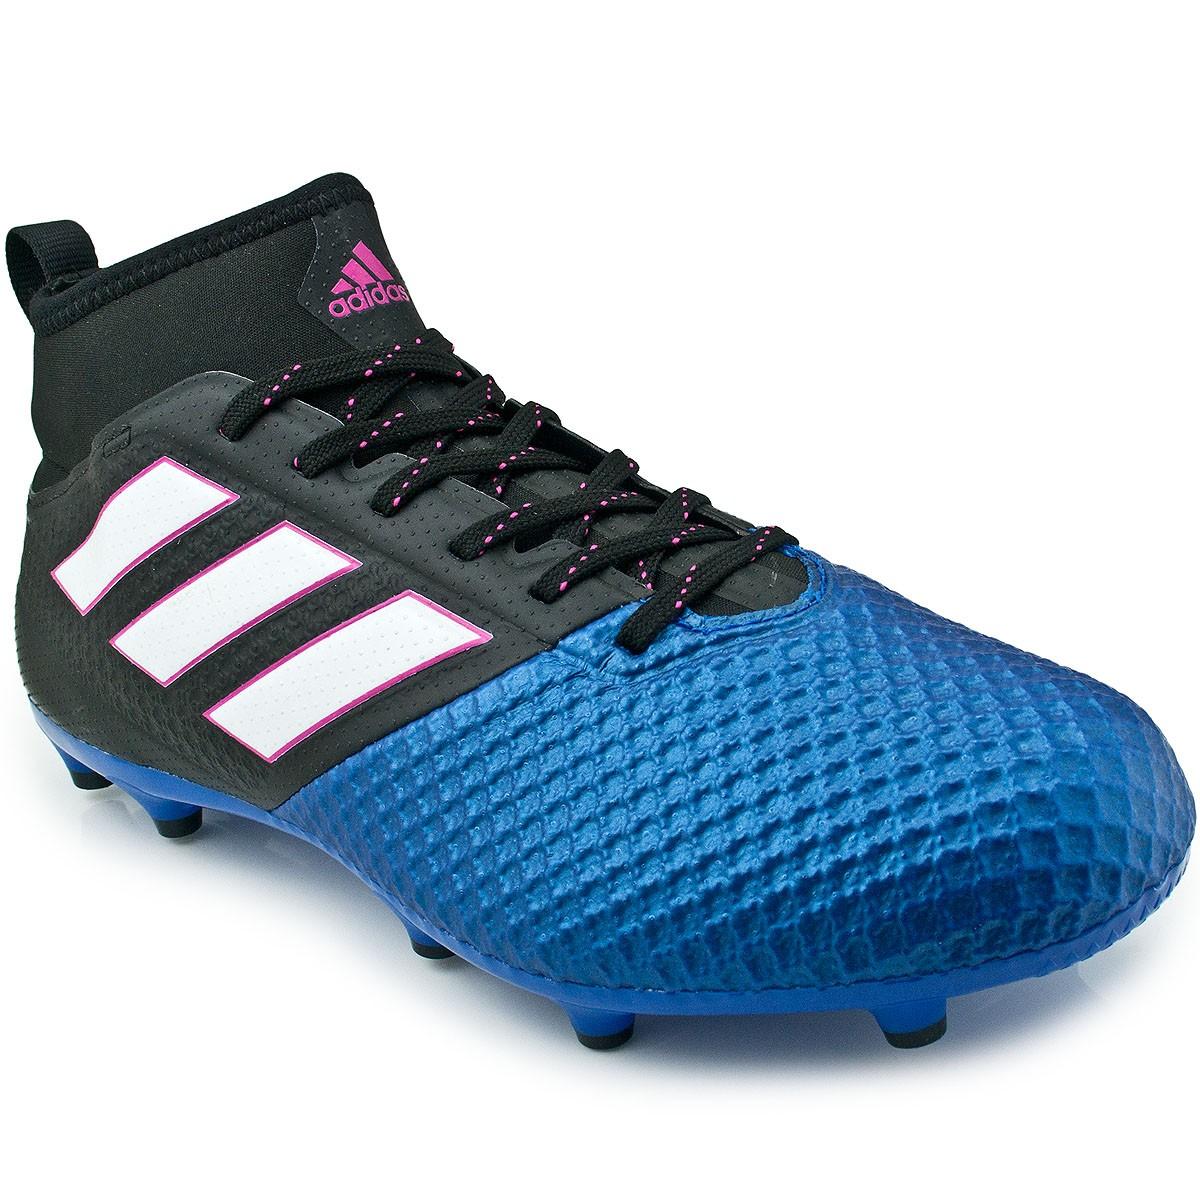 7e6deb44ef2 Chuteira Adidas Ace 17.3 Primemesh FG